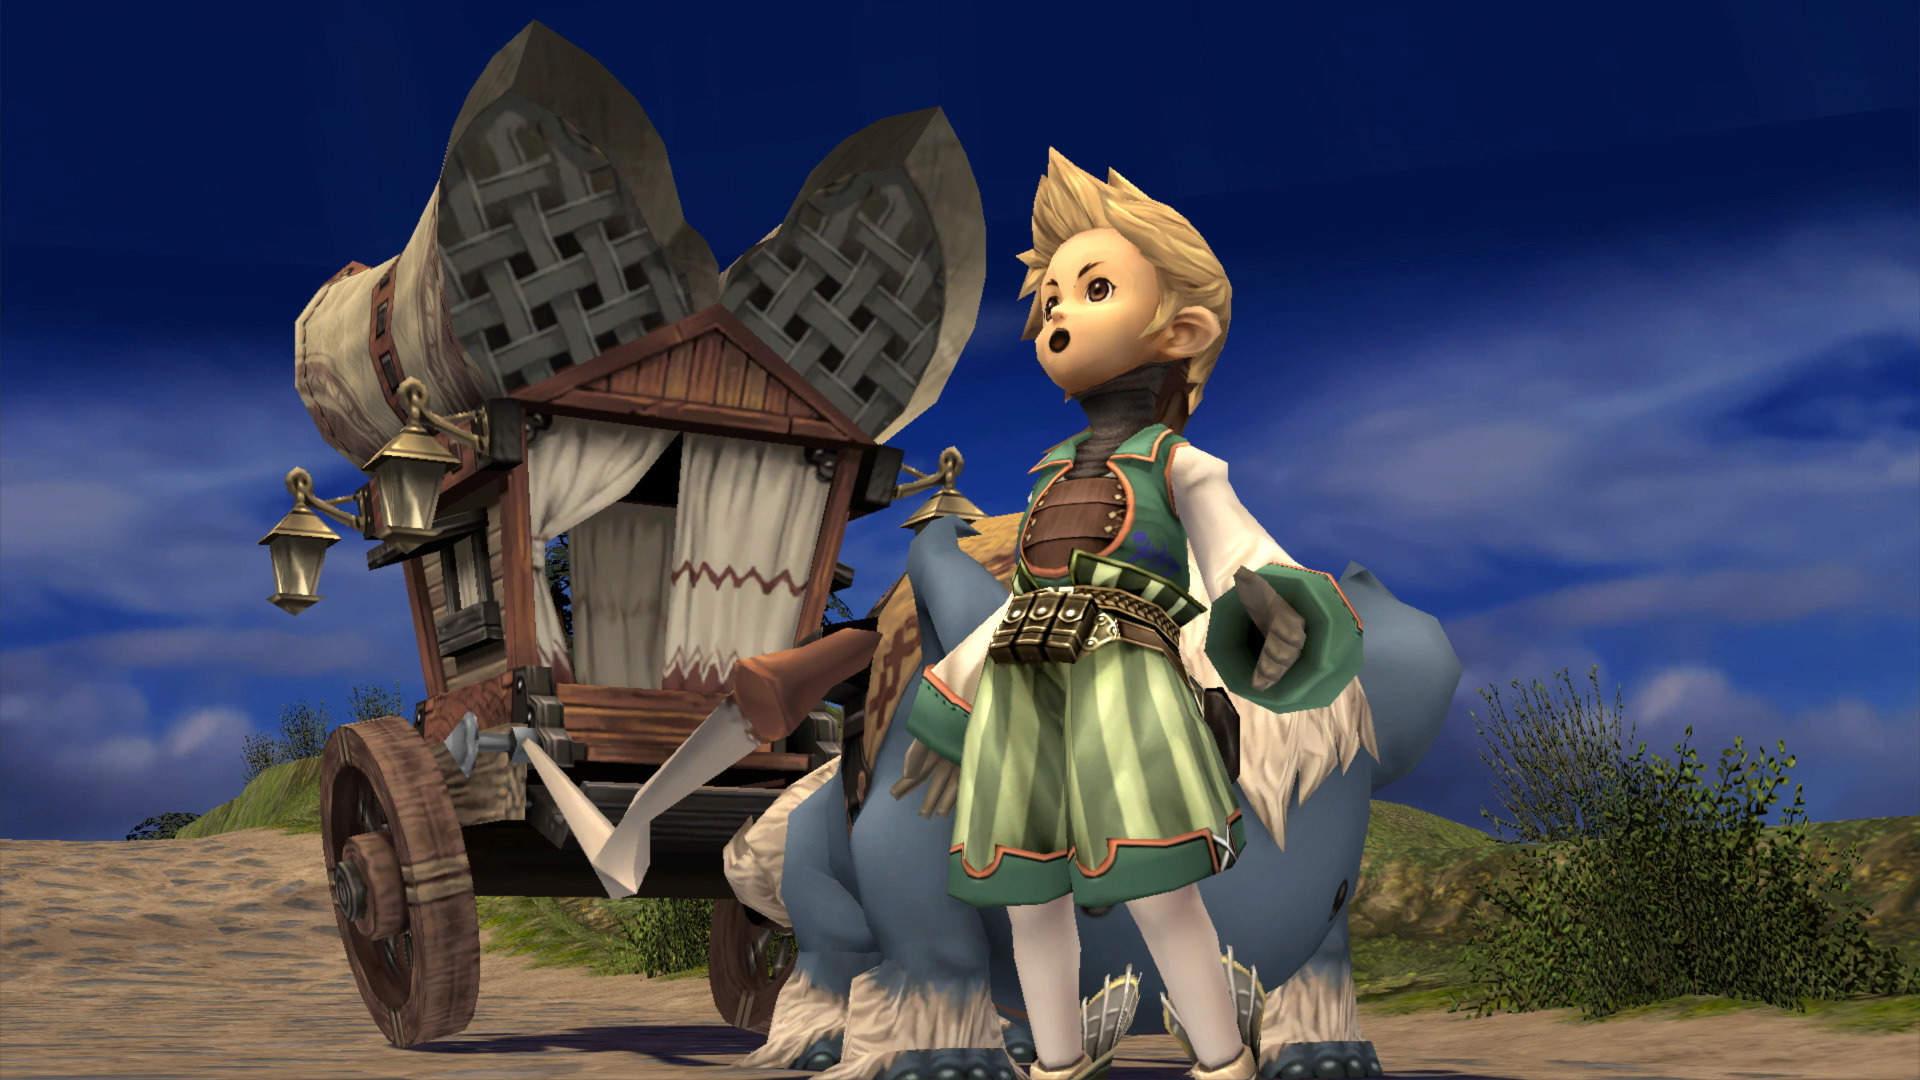 Final Fantasy Crystal Chronicles Remastered: Releasetermin mit neuem Trailer enthüllt